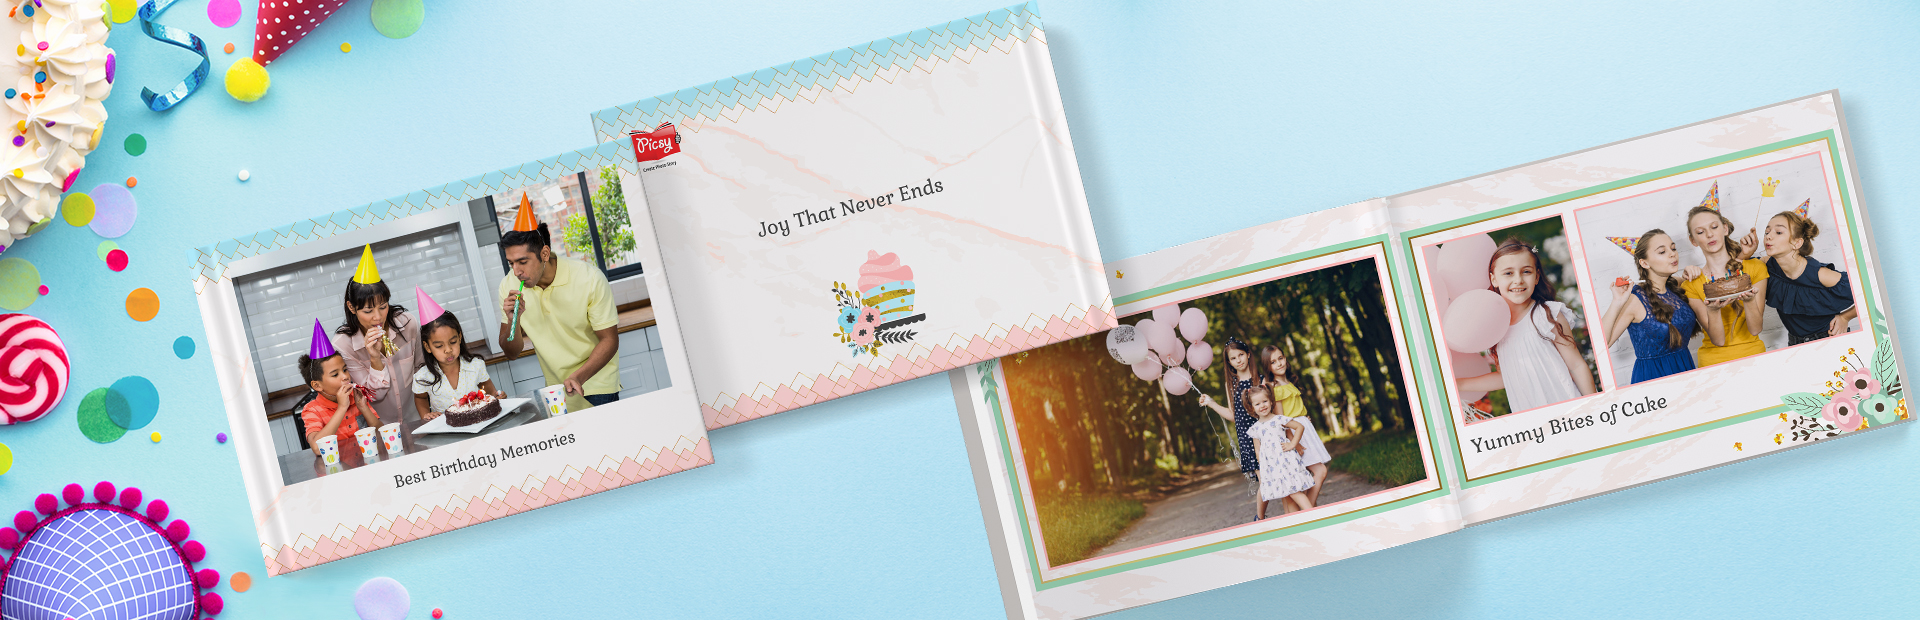 Birthday Photo Book Printing - Picsy